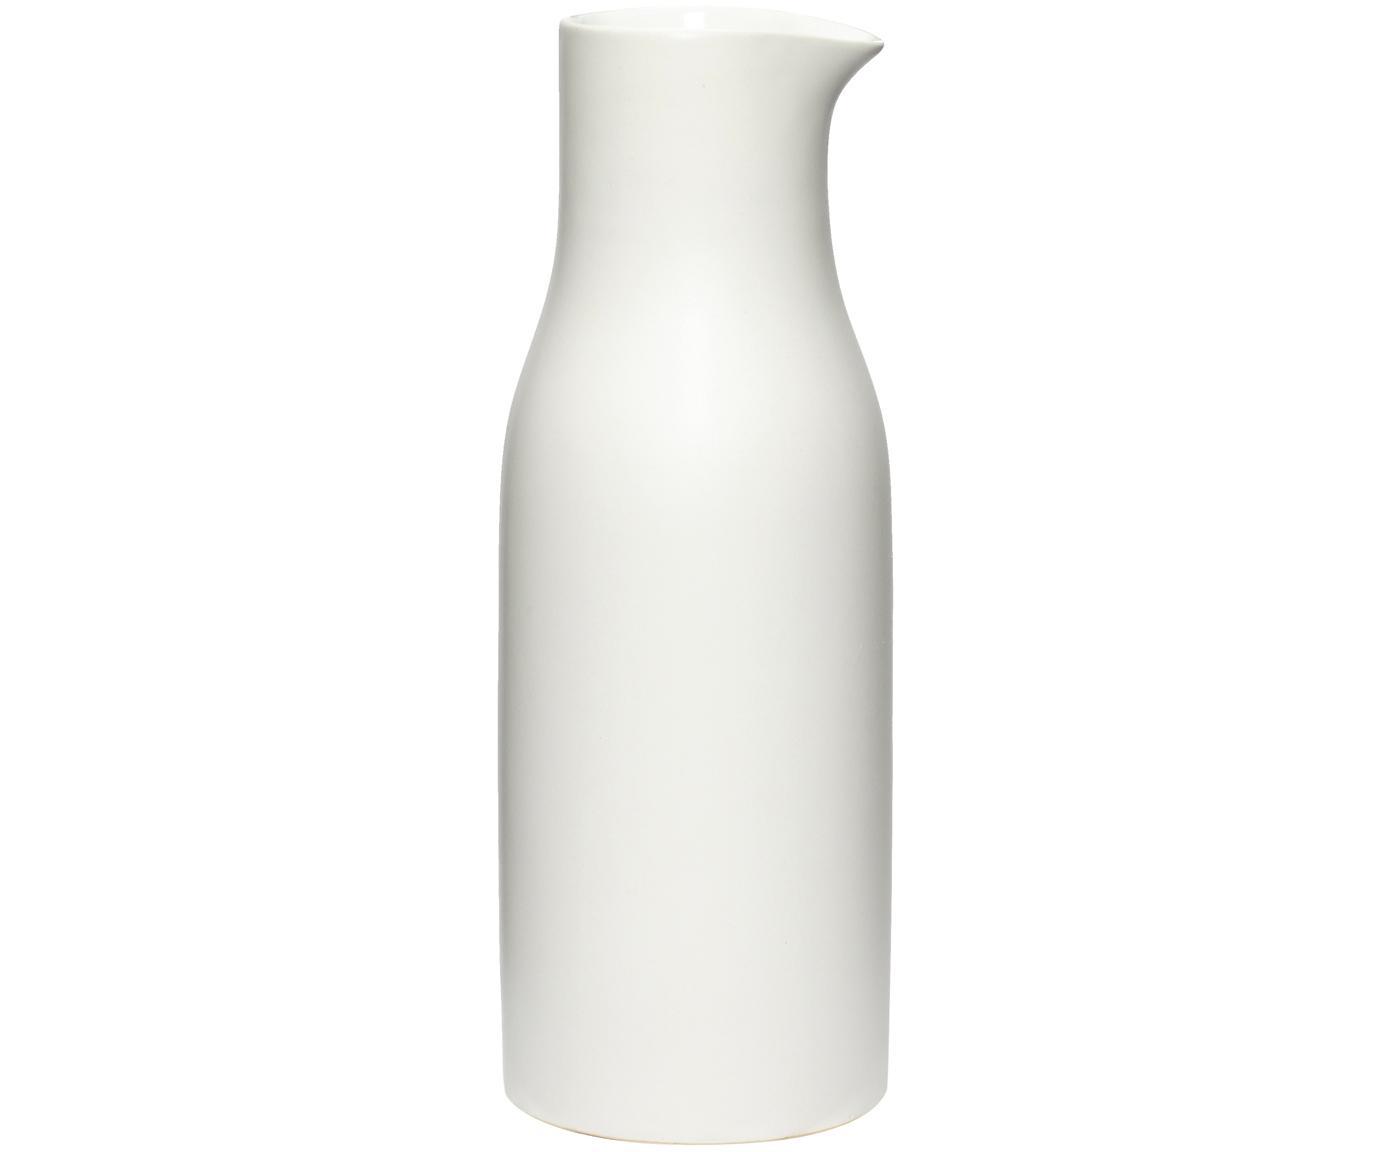 Krug Sogbo, Porzellan, Weiss, 1.5 L